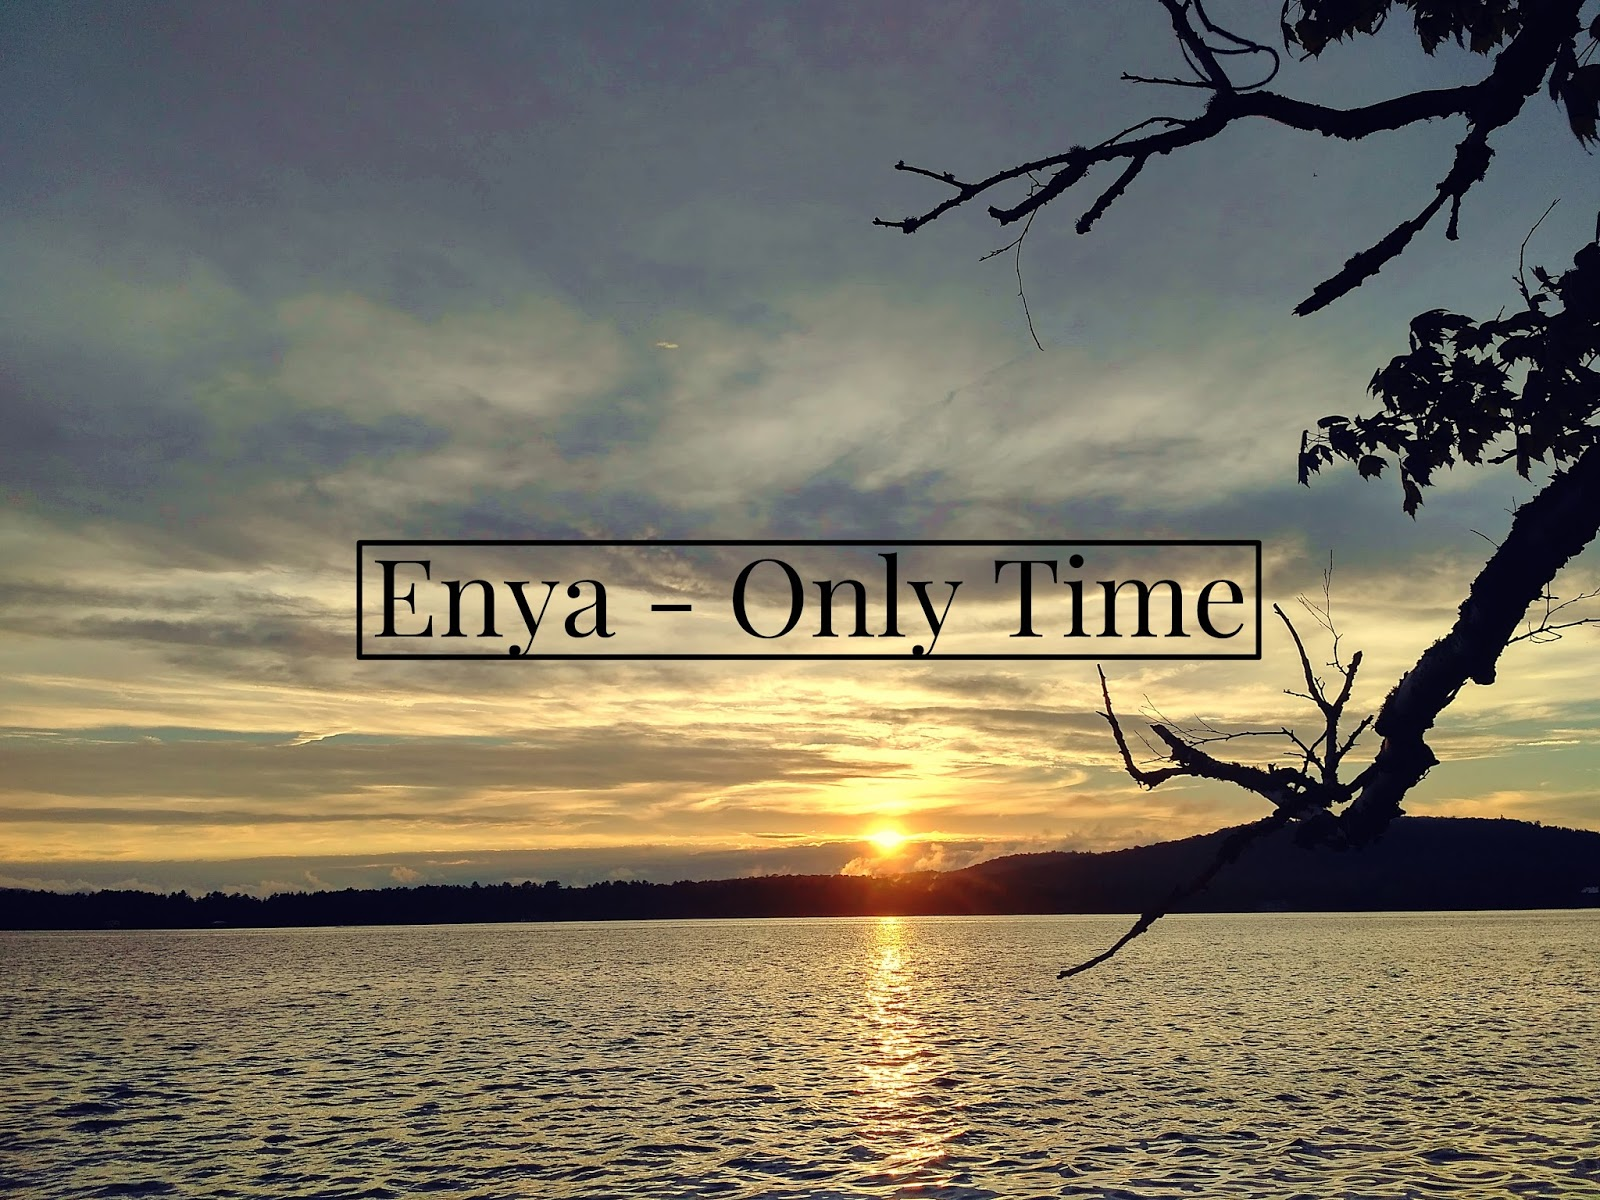 Listen to: Enya. Początek serii o muzyce